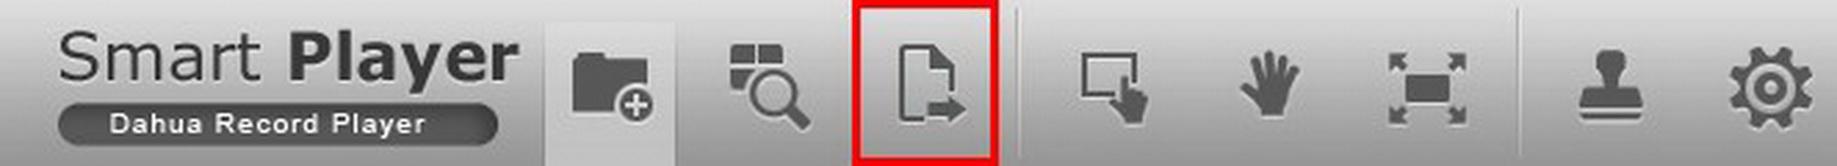 SmartPlayer-06